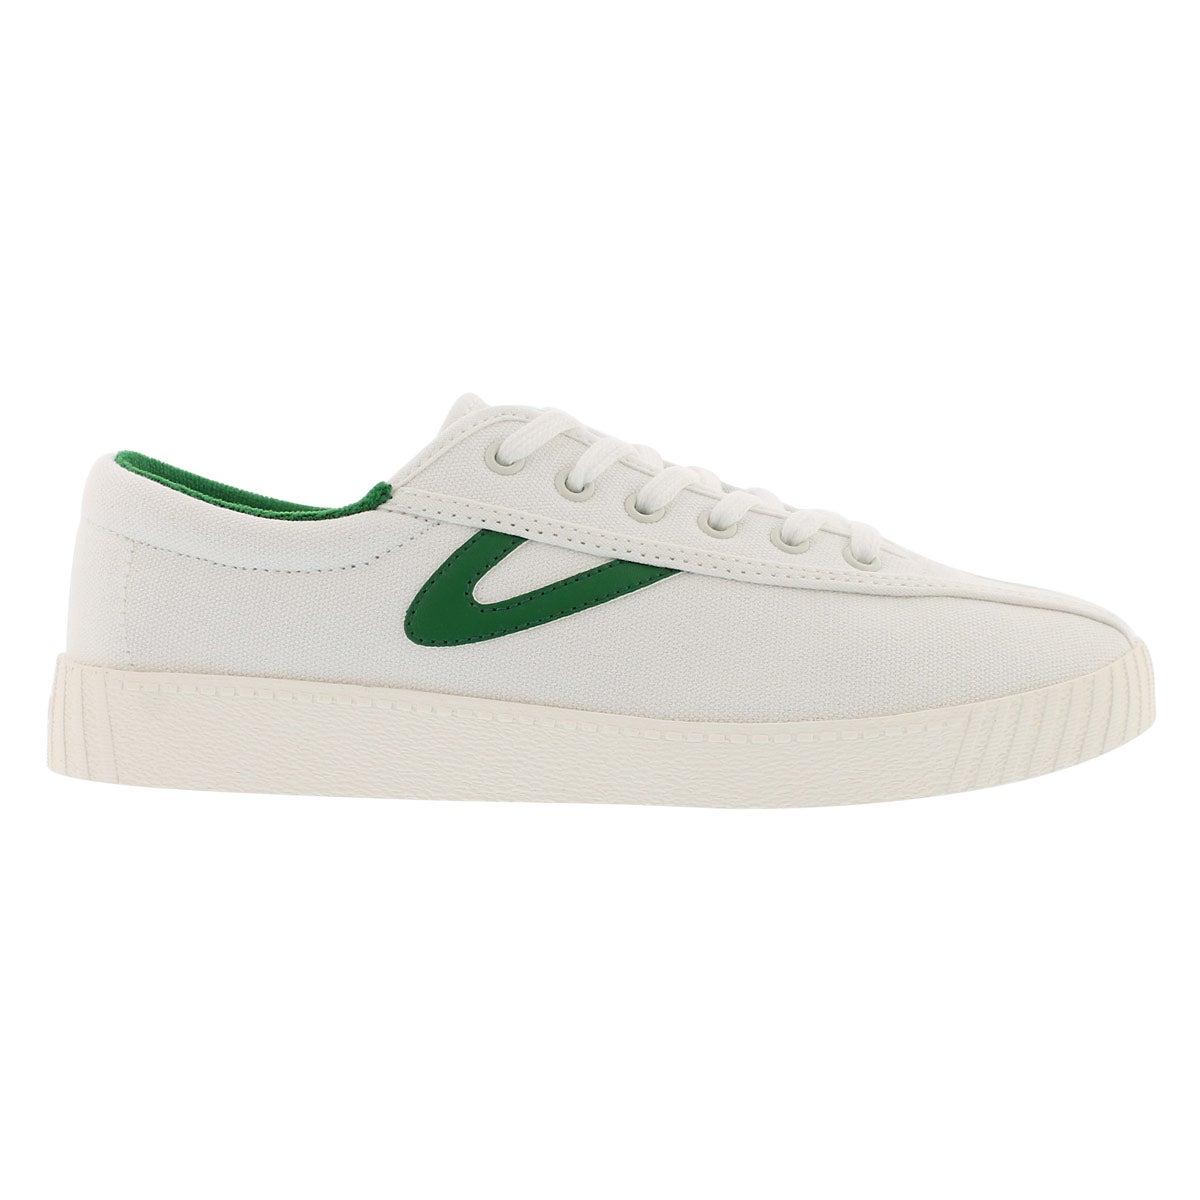 Lds Nylite Plus white/green sneaker